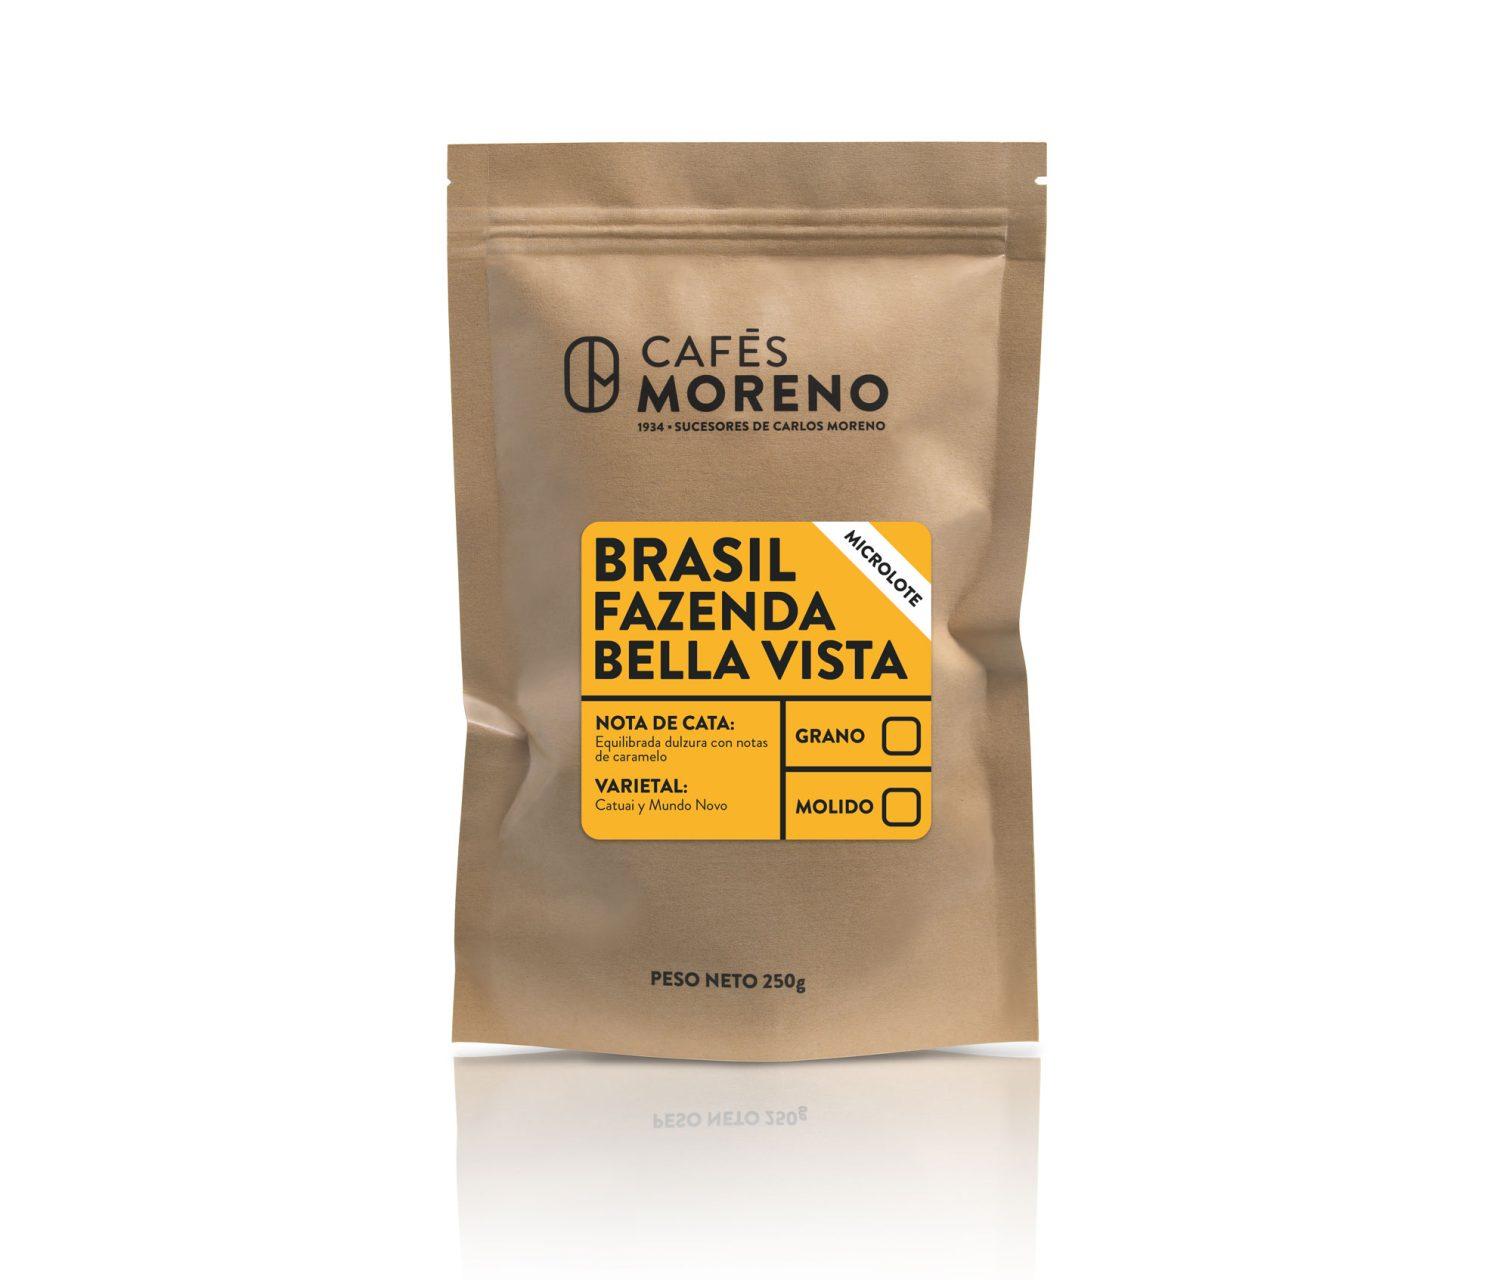 foto bolsa de café brasil Fazenda bella vista